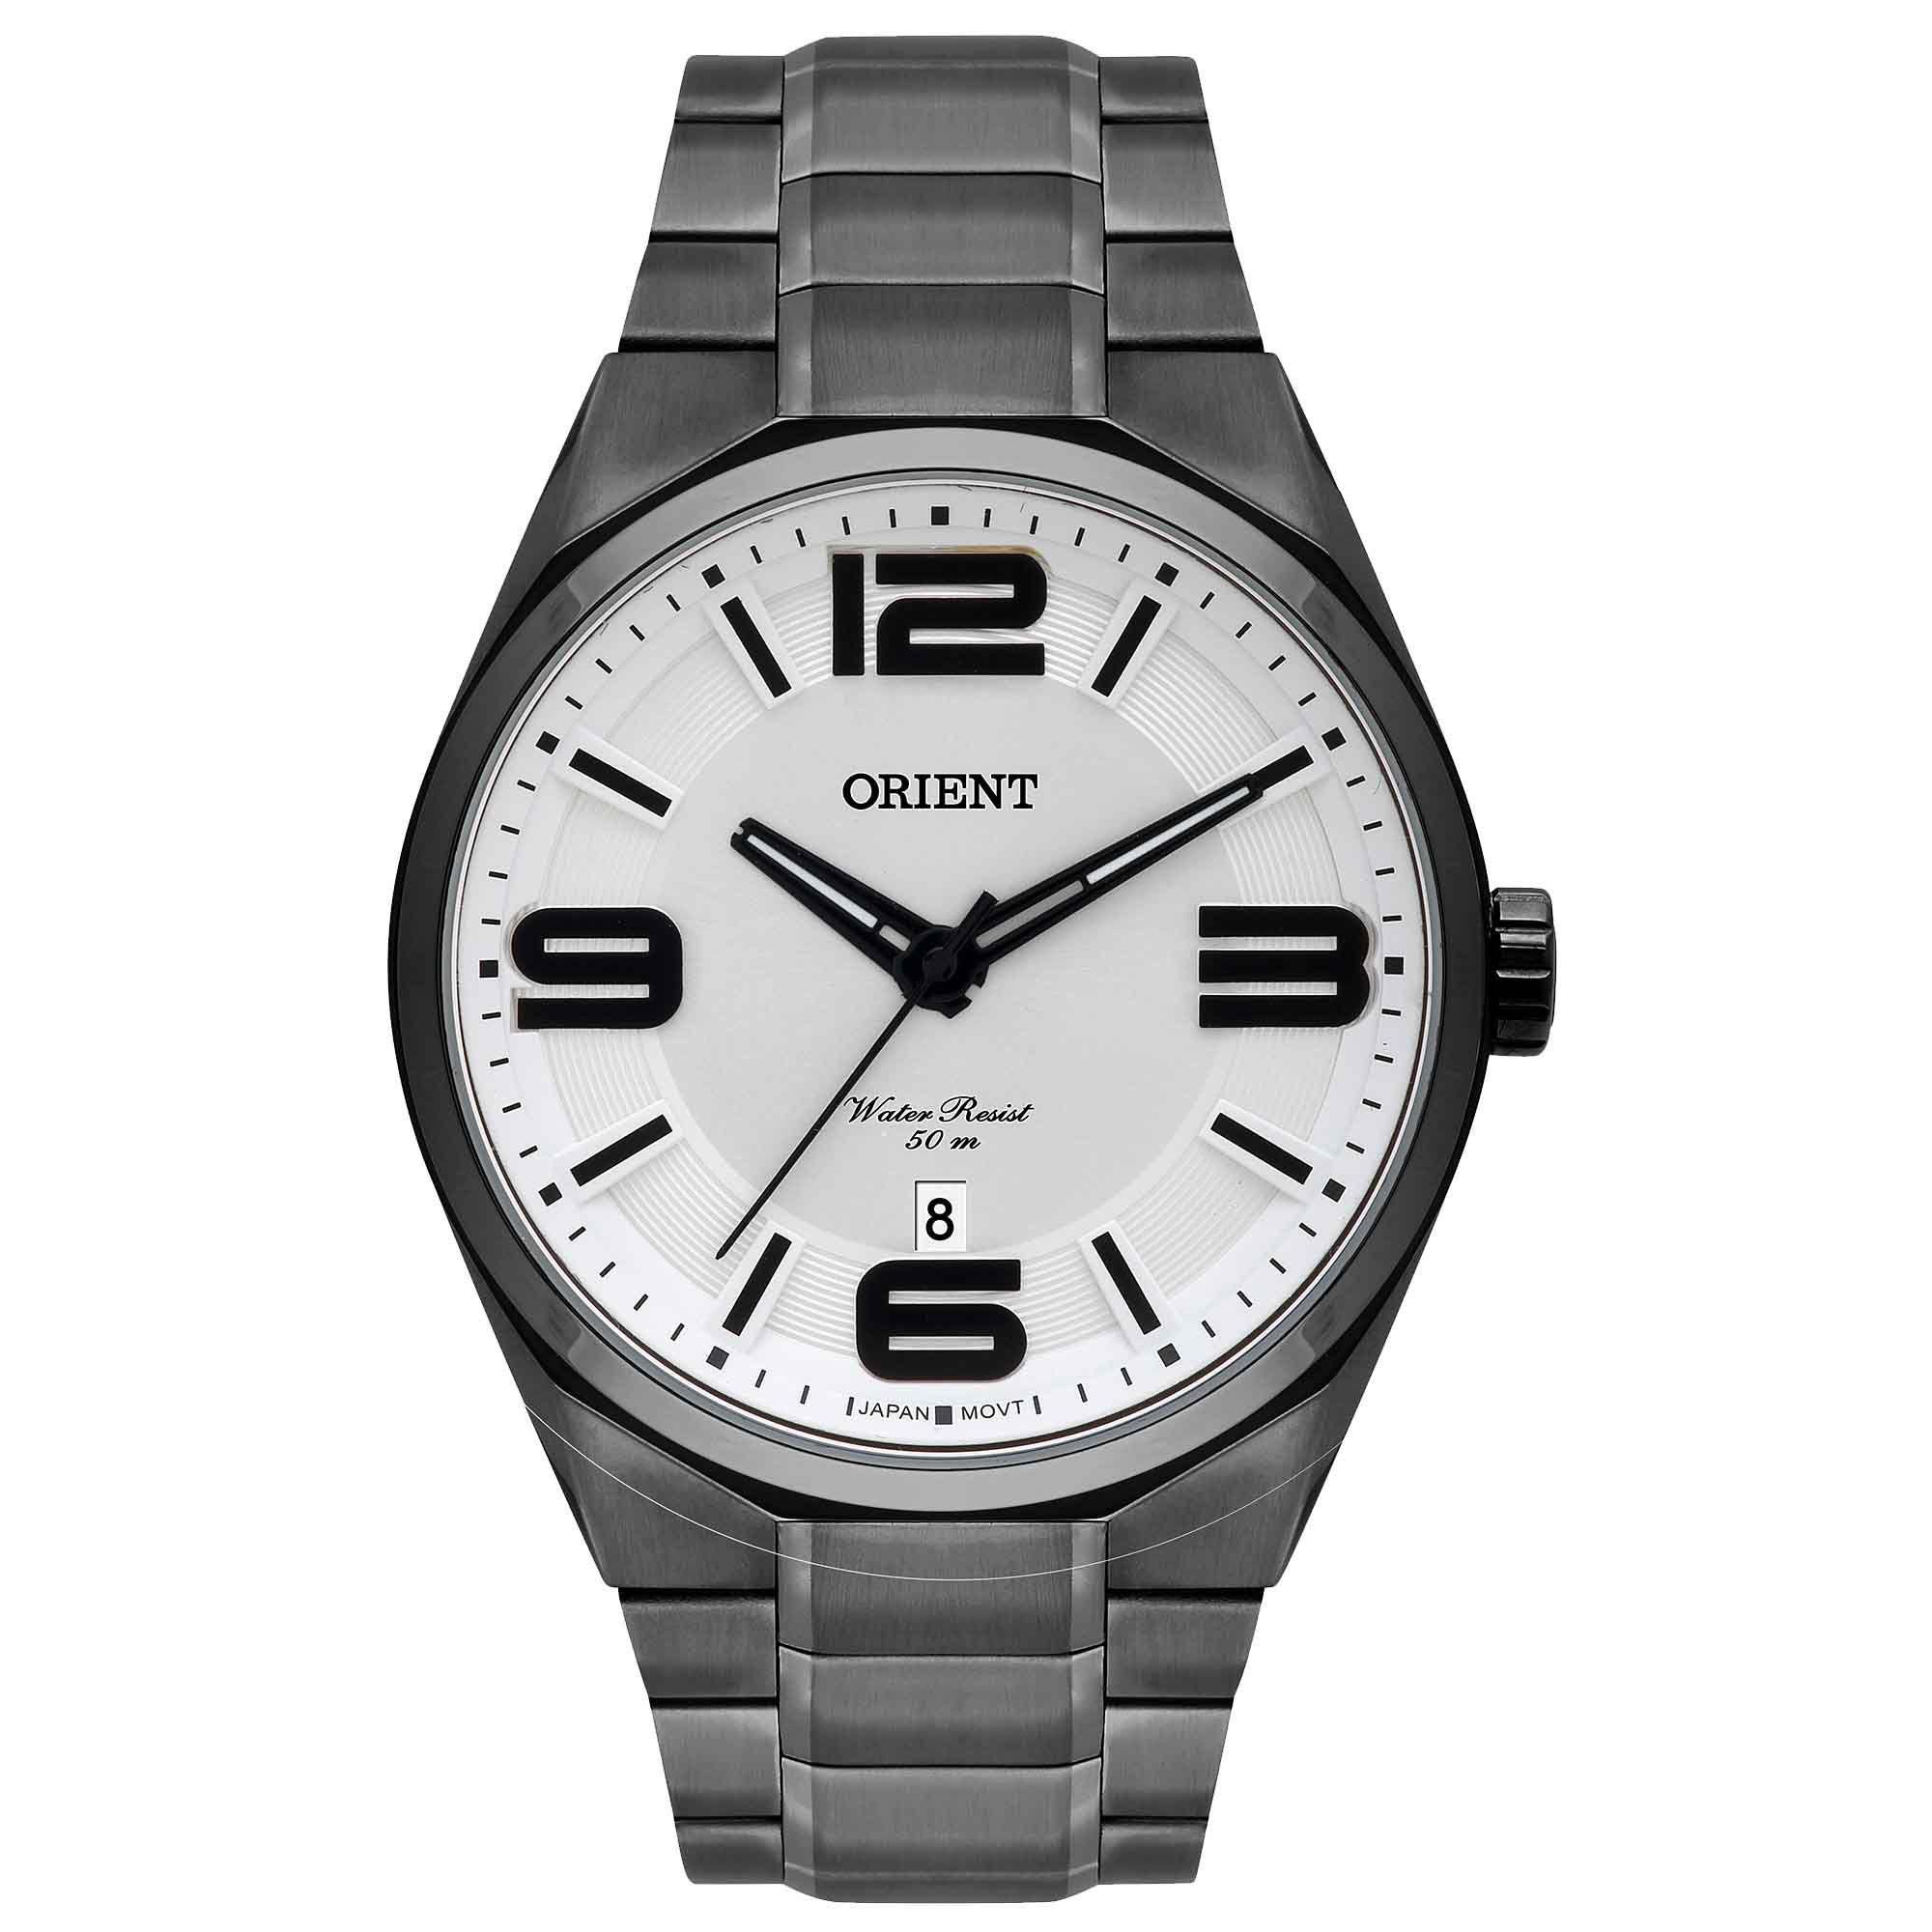 Relógio Masculino Orient MPSS1002 S2PX